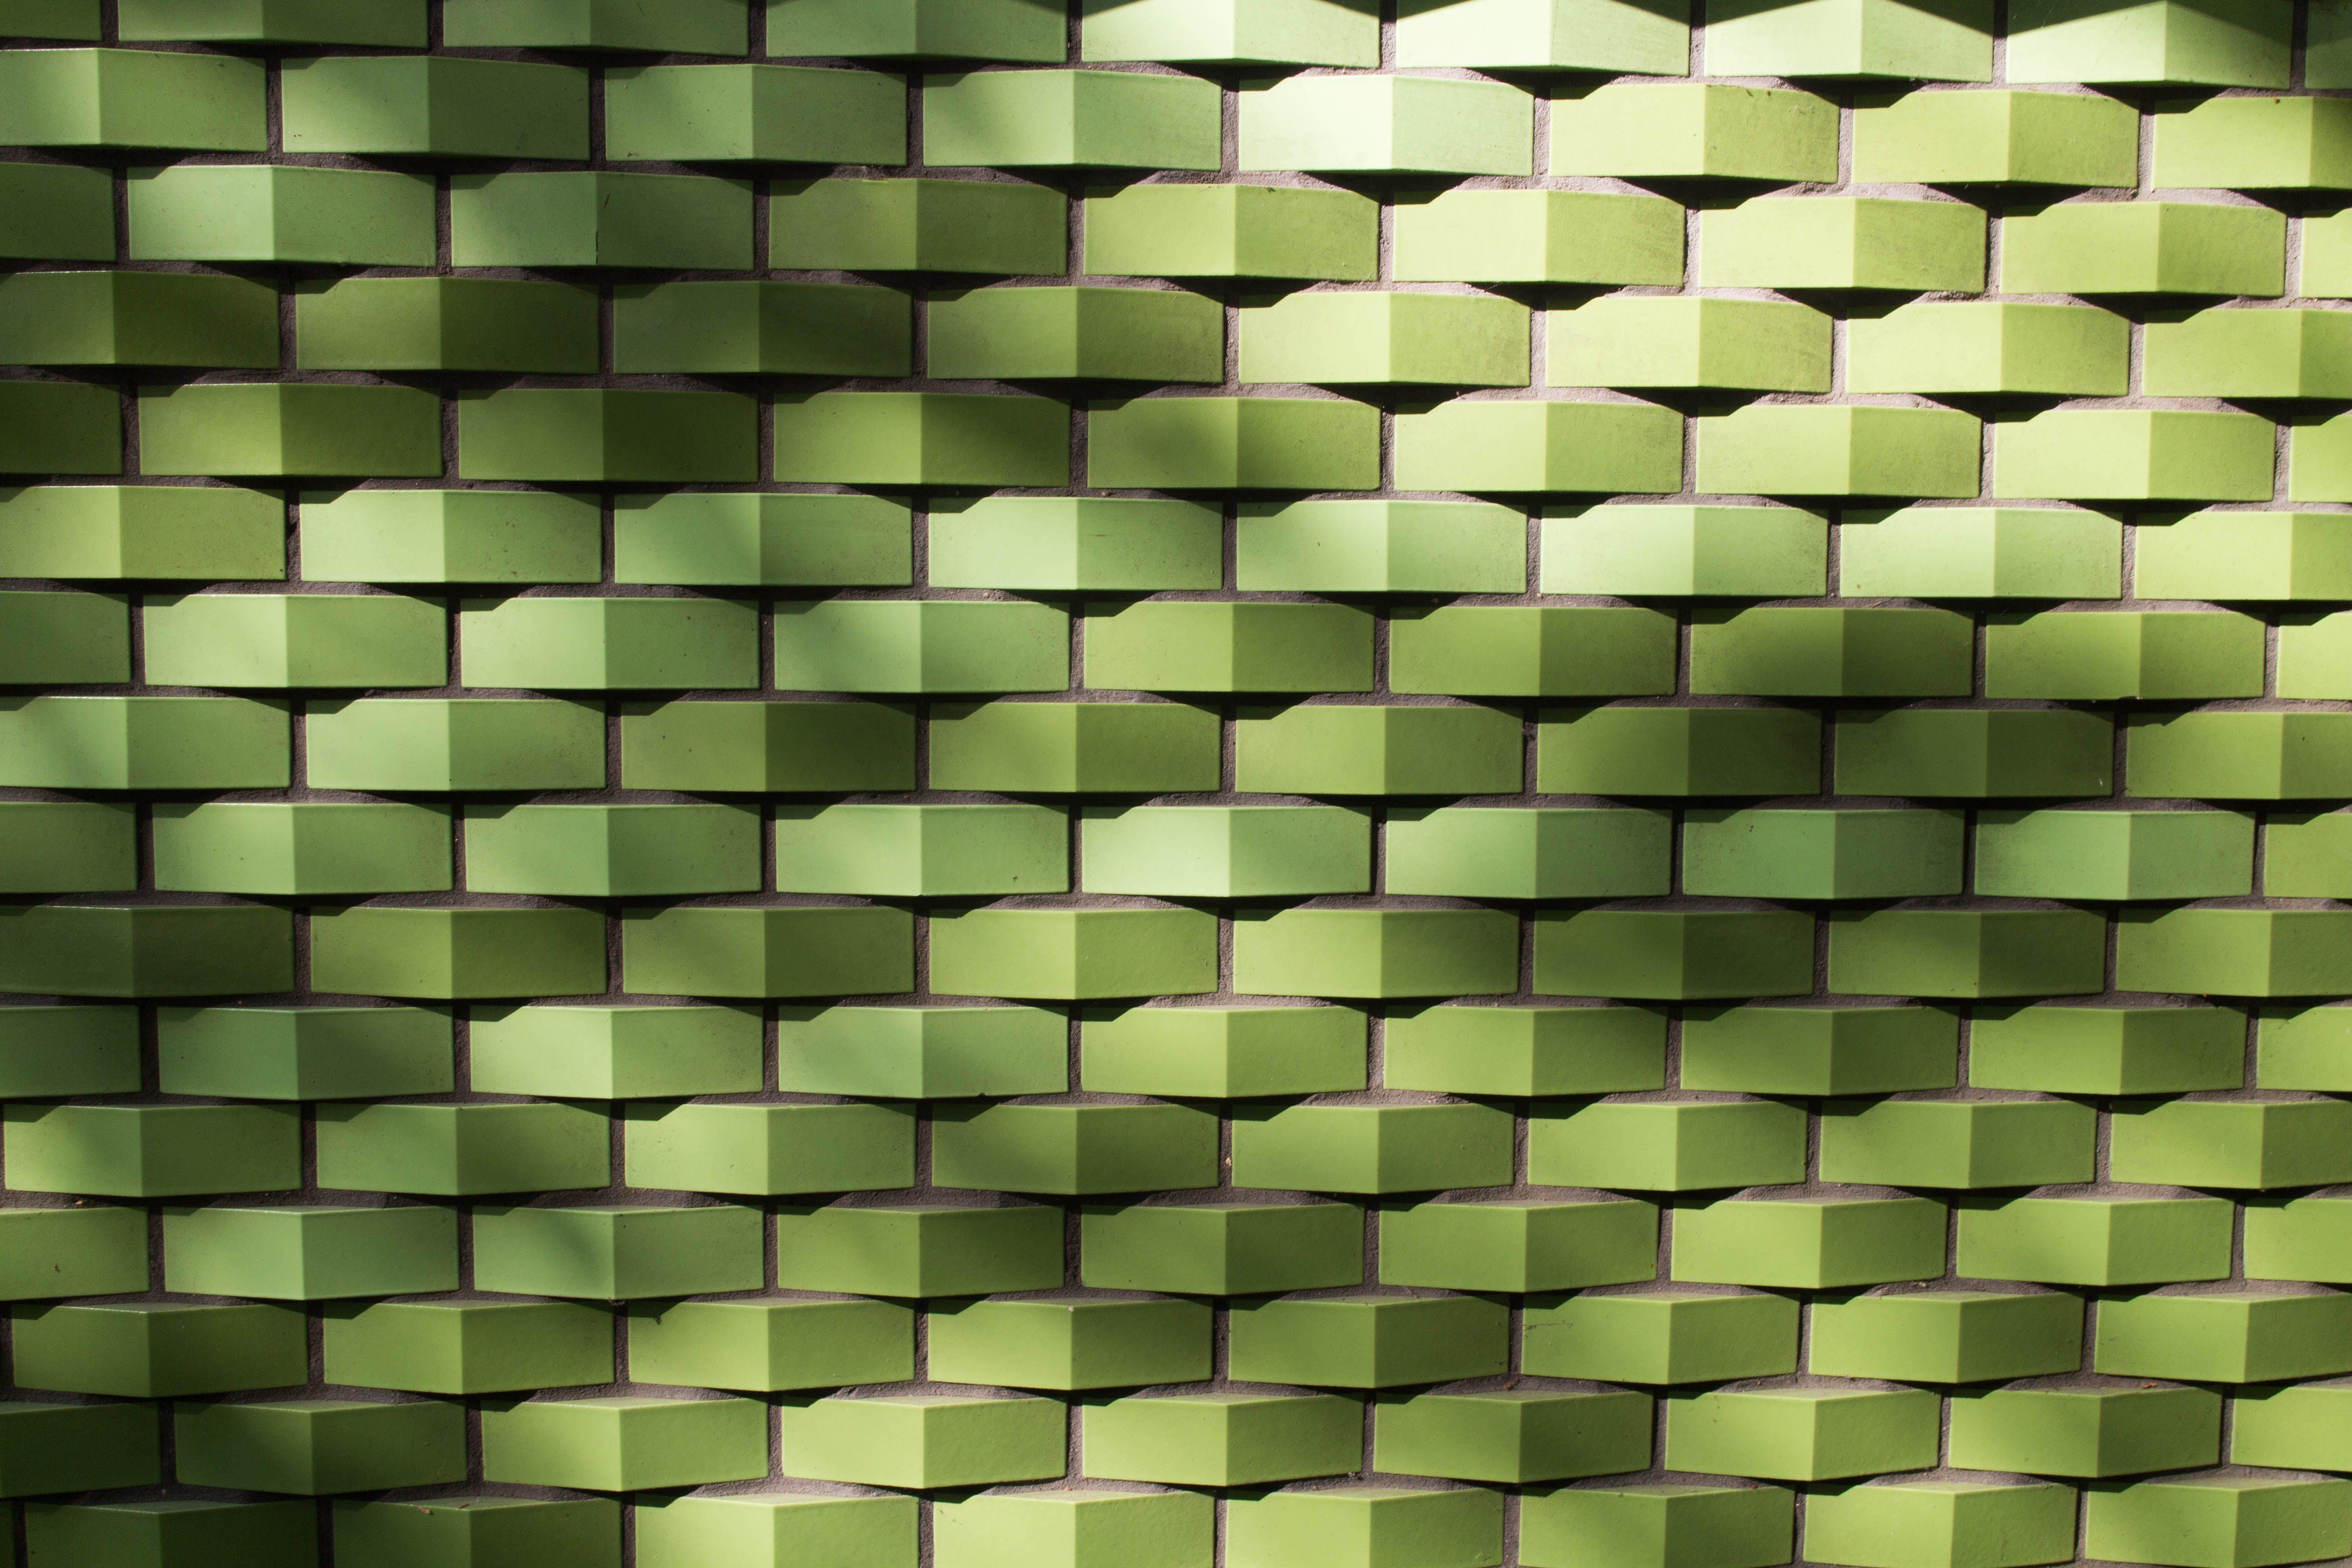 Green Woven Pavement